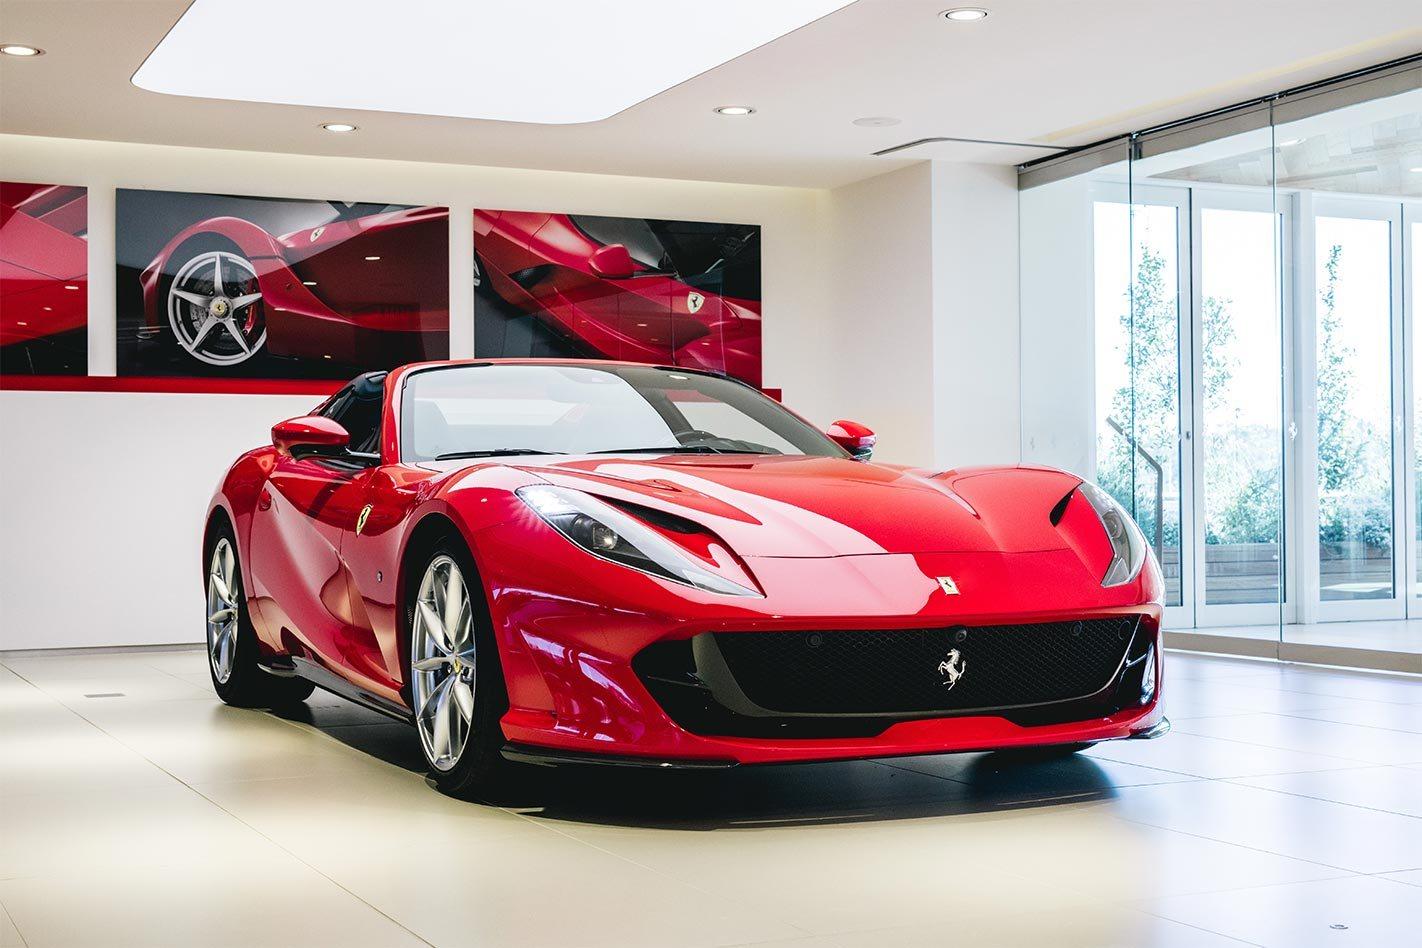 Ferrari 812 Gts Australian Pricing And Specs Revealed